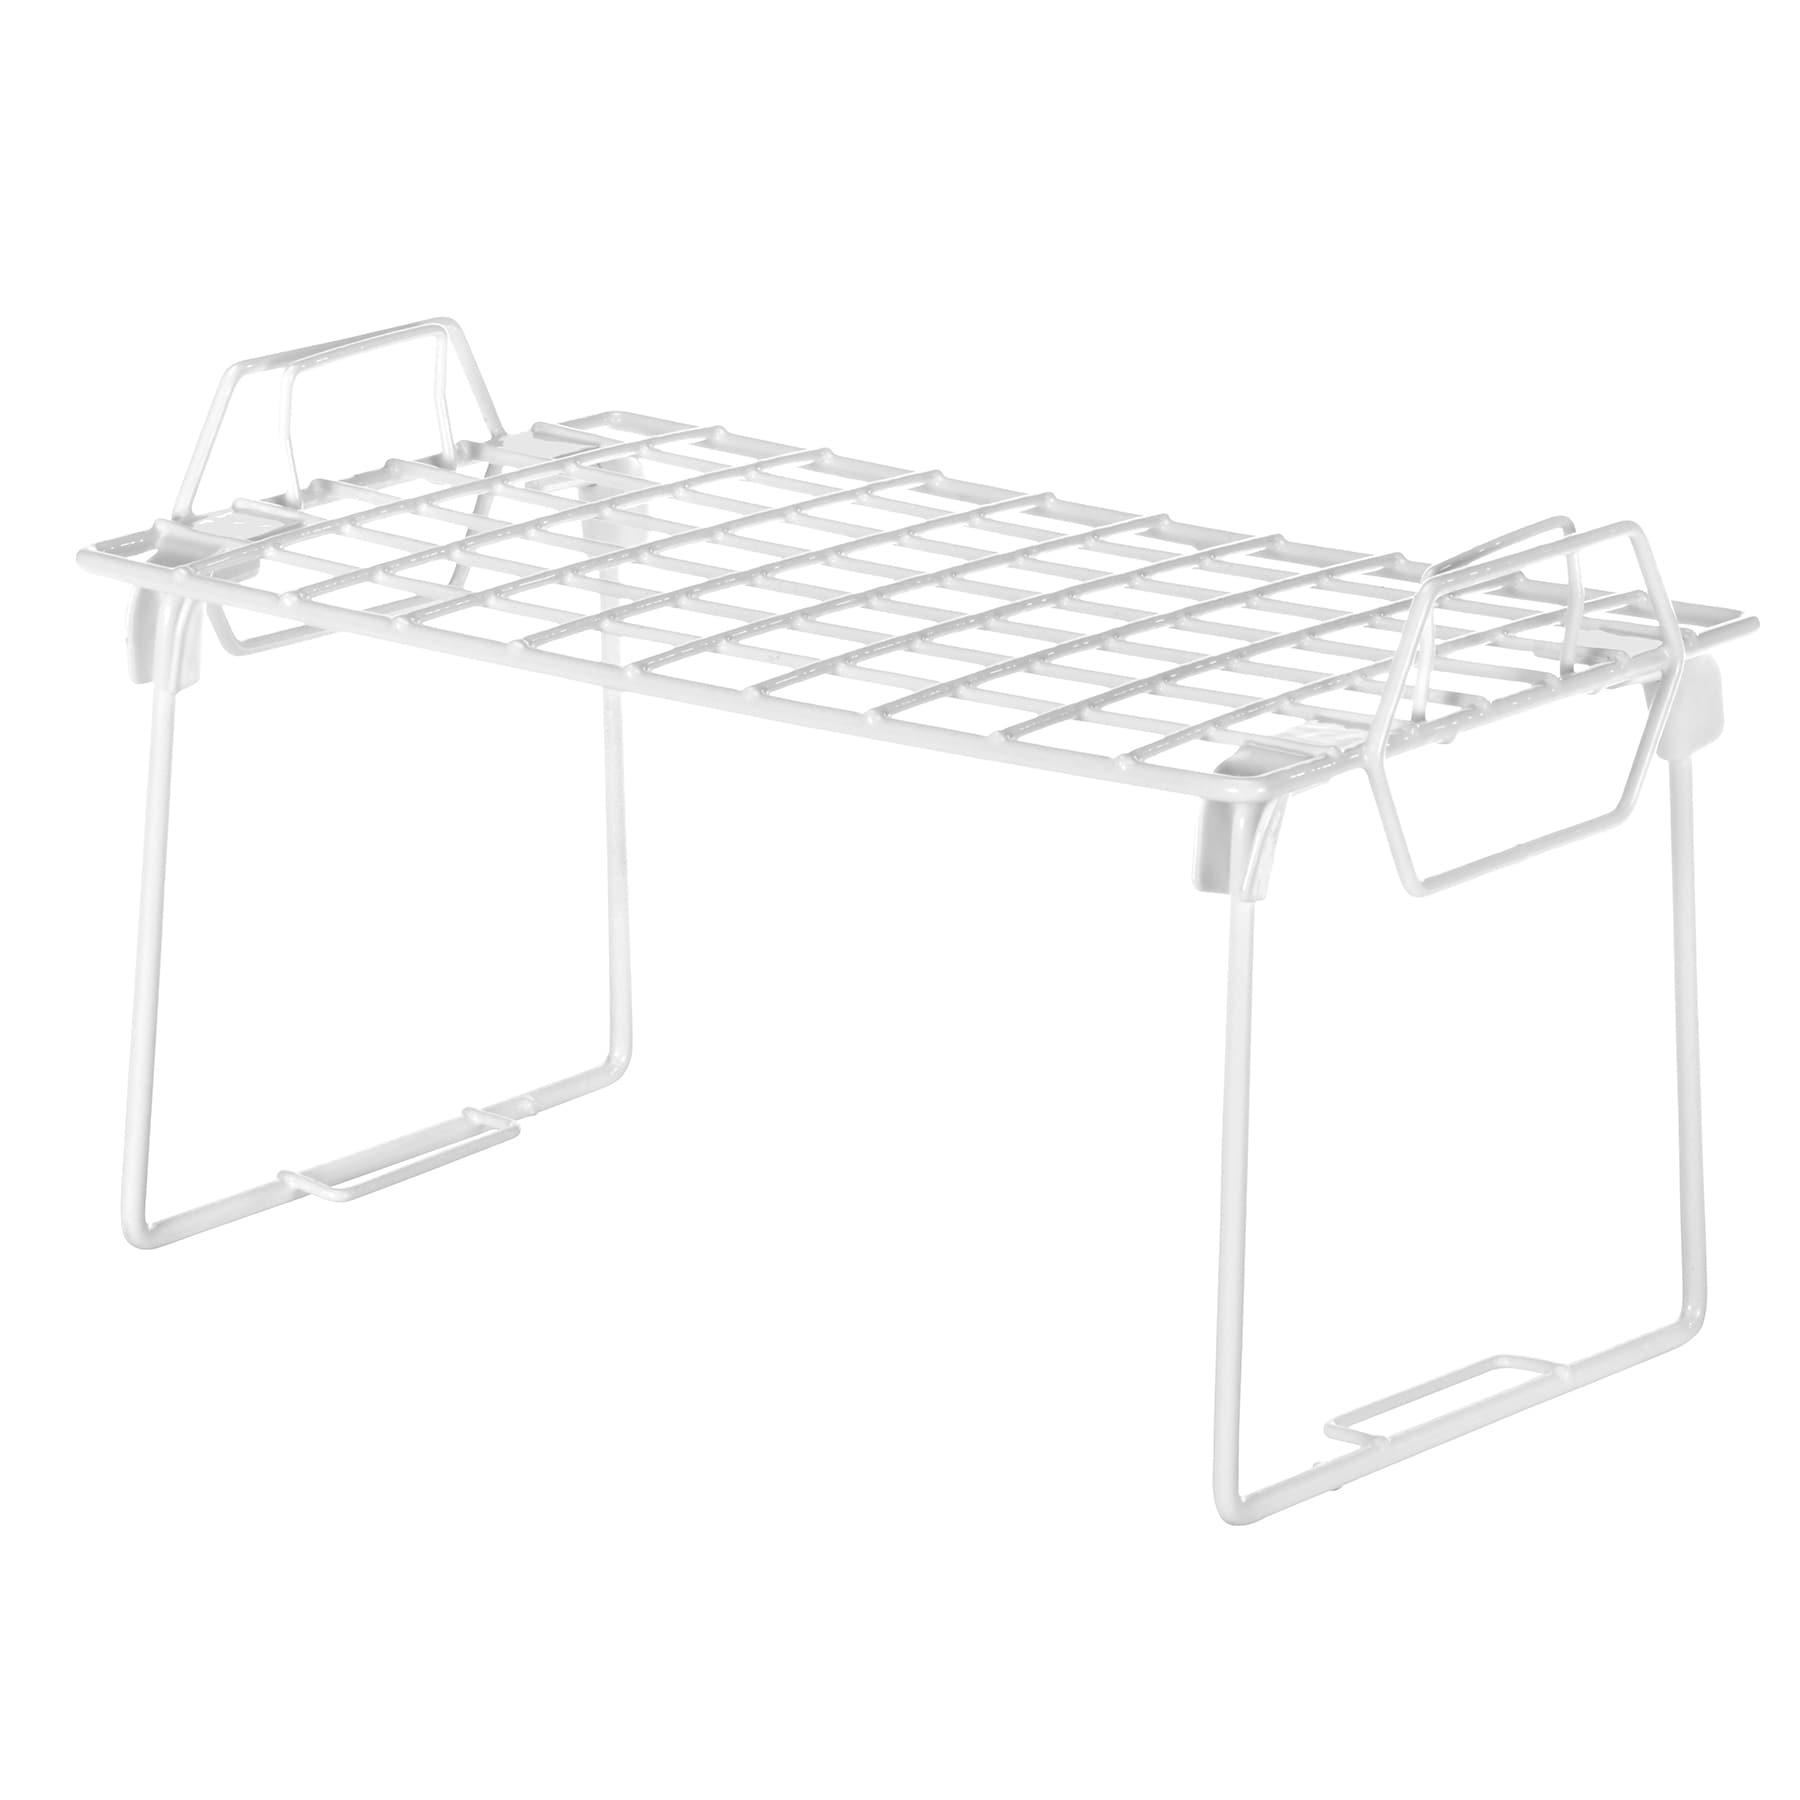 Whitmor Mfg Co 6023-3812 Small White Grid Stacking Shelf ...